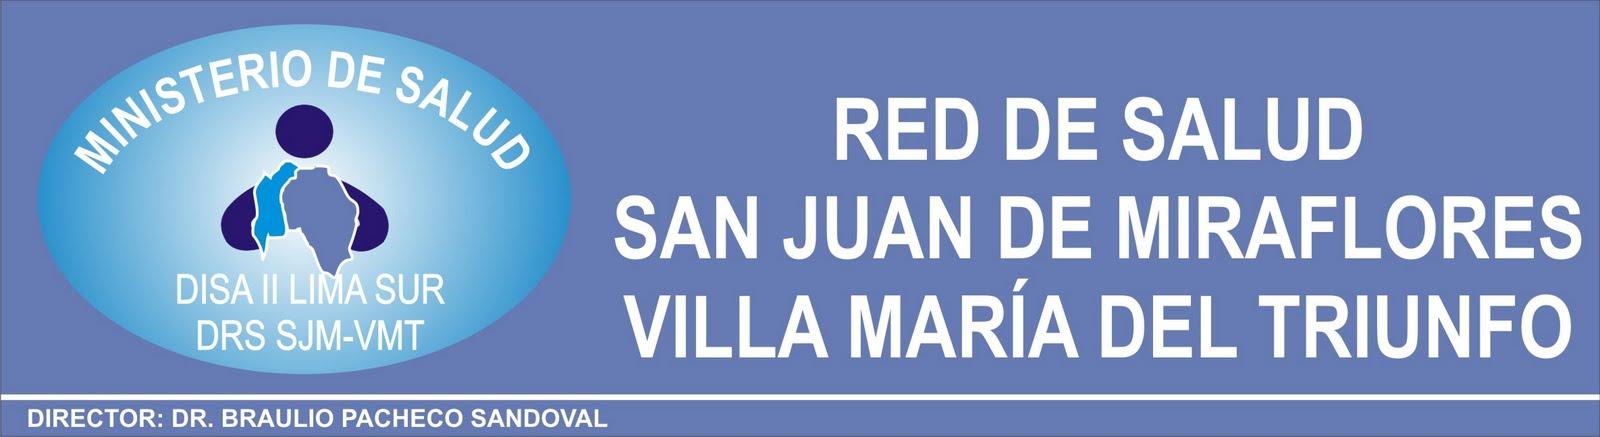 RED DE SALUD SJM VMT